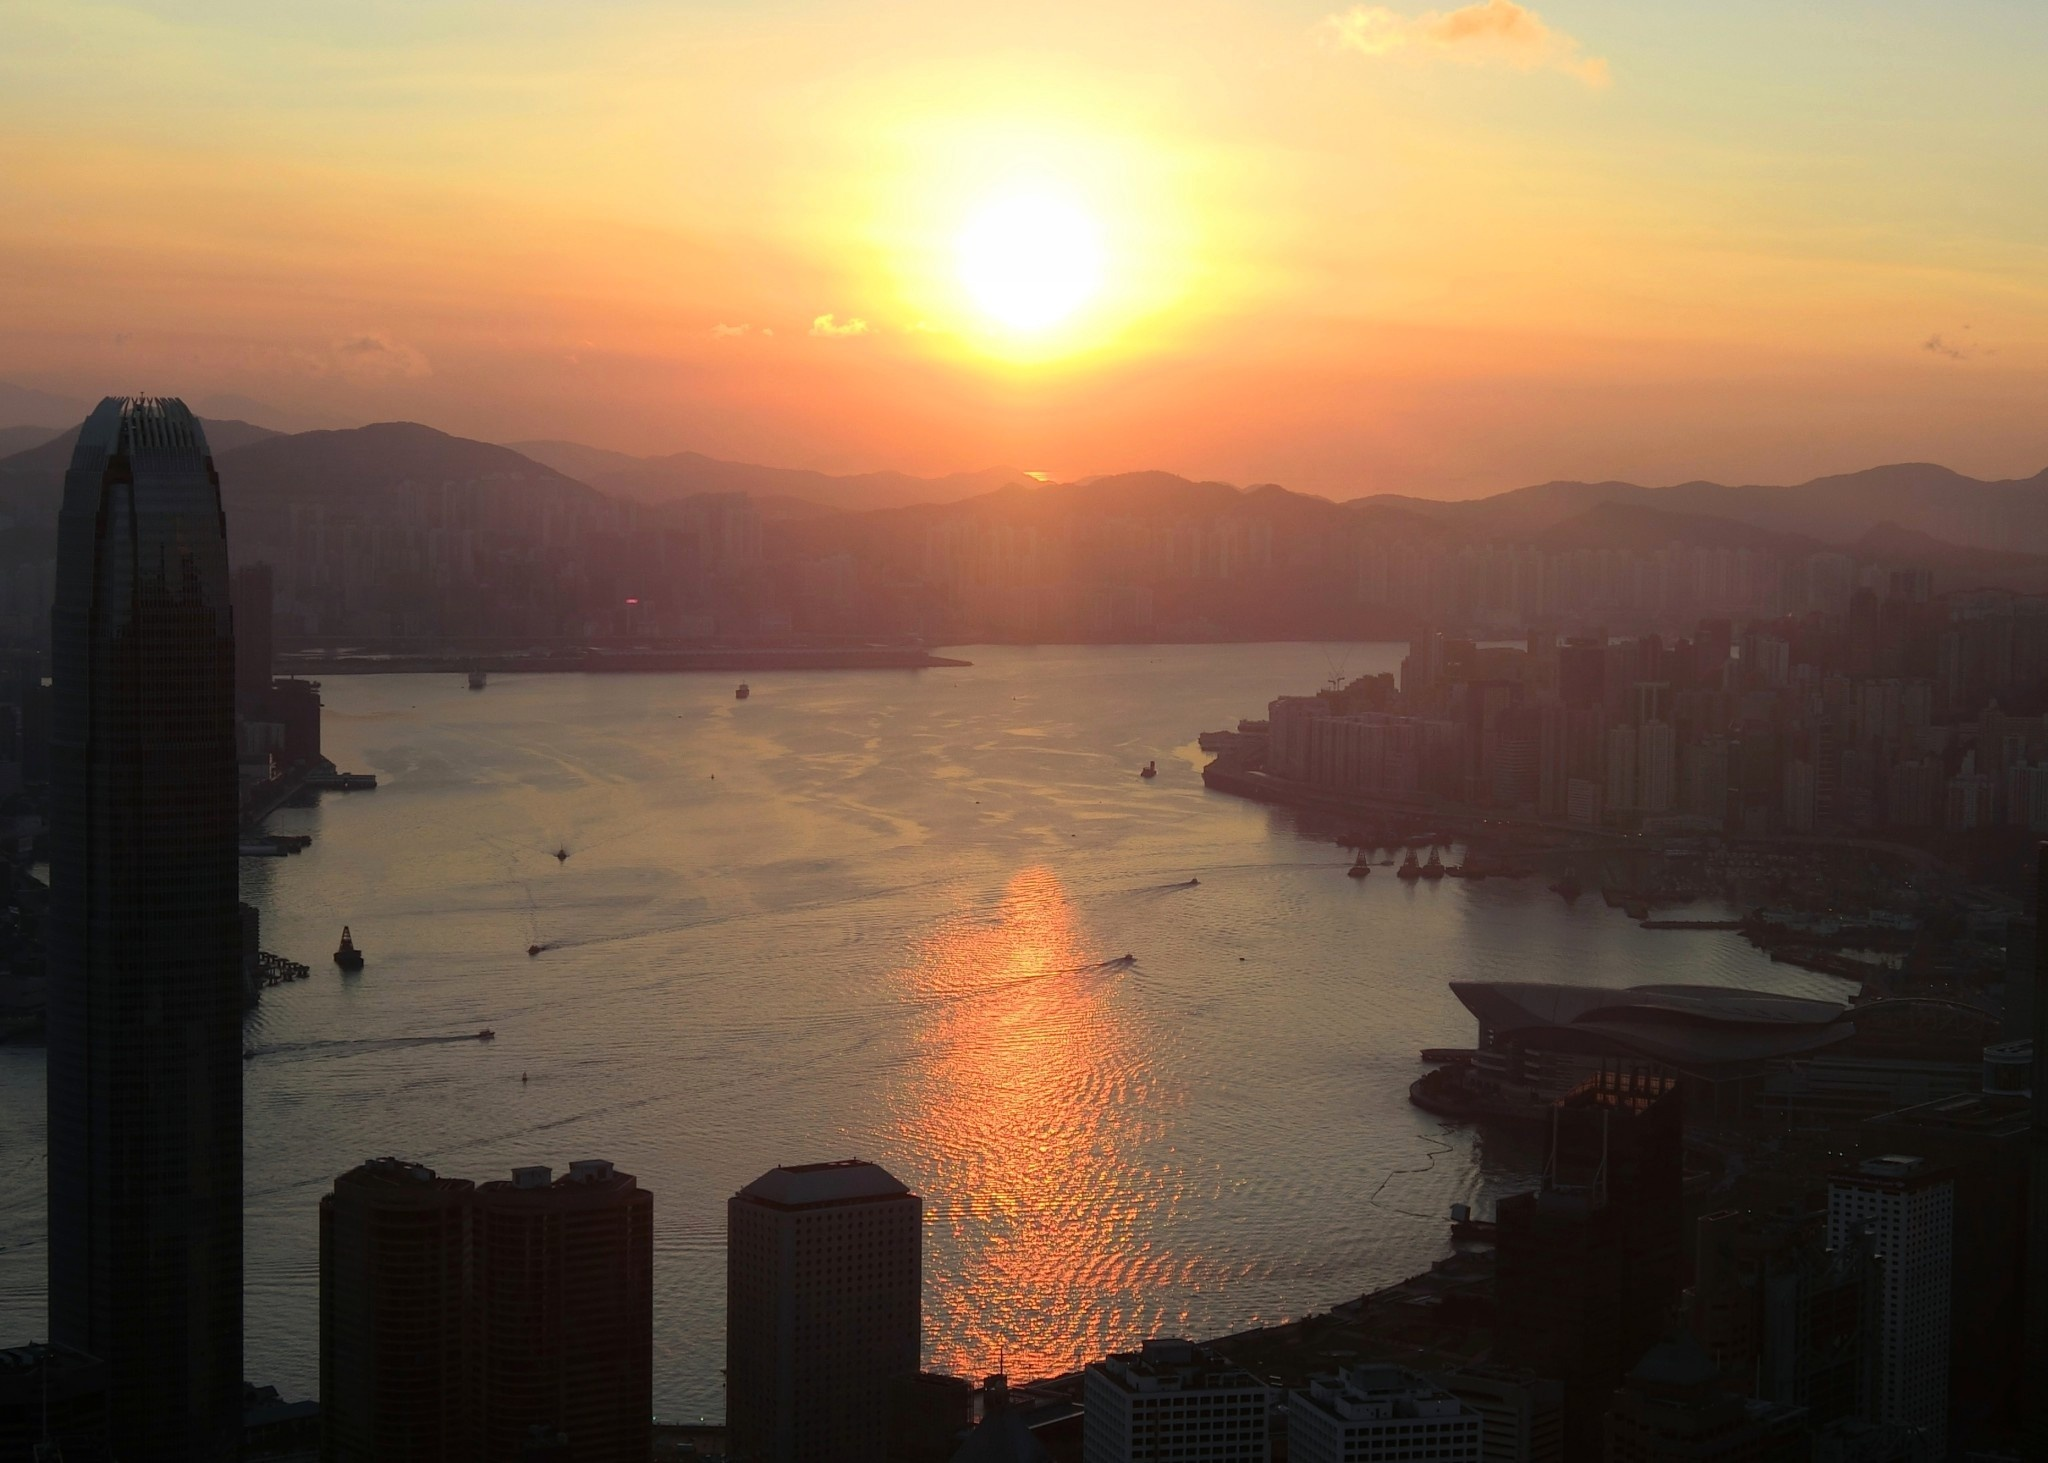 Sunrise, HK-7 by pop88123